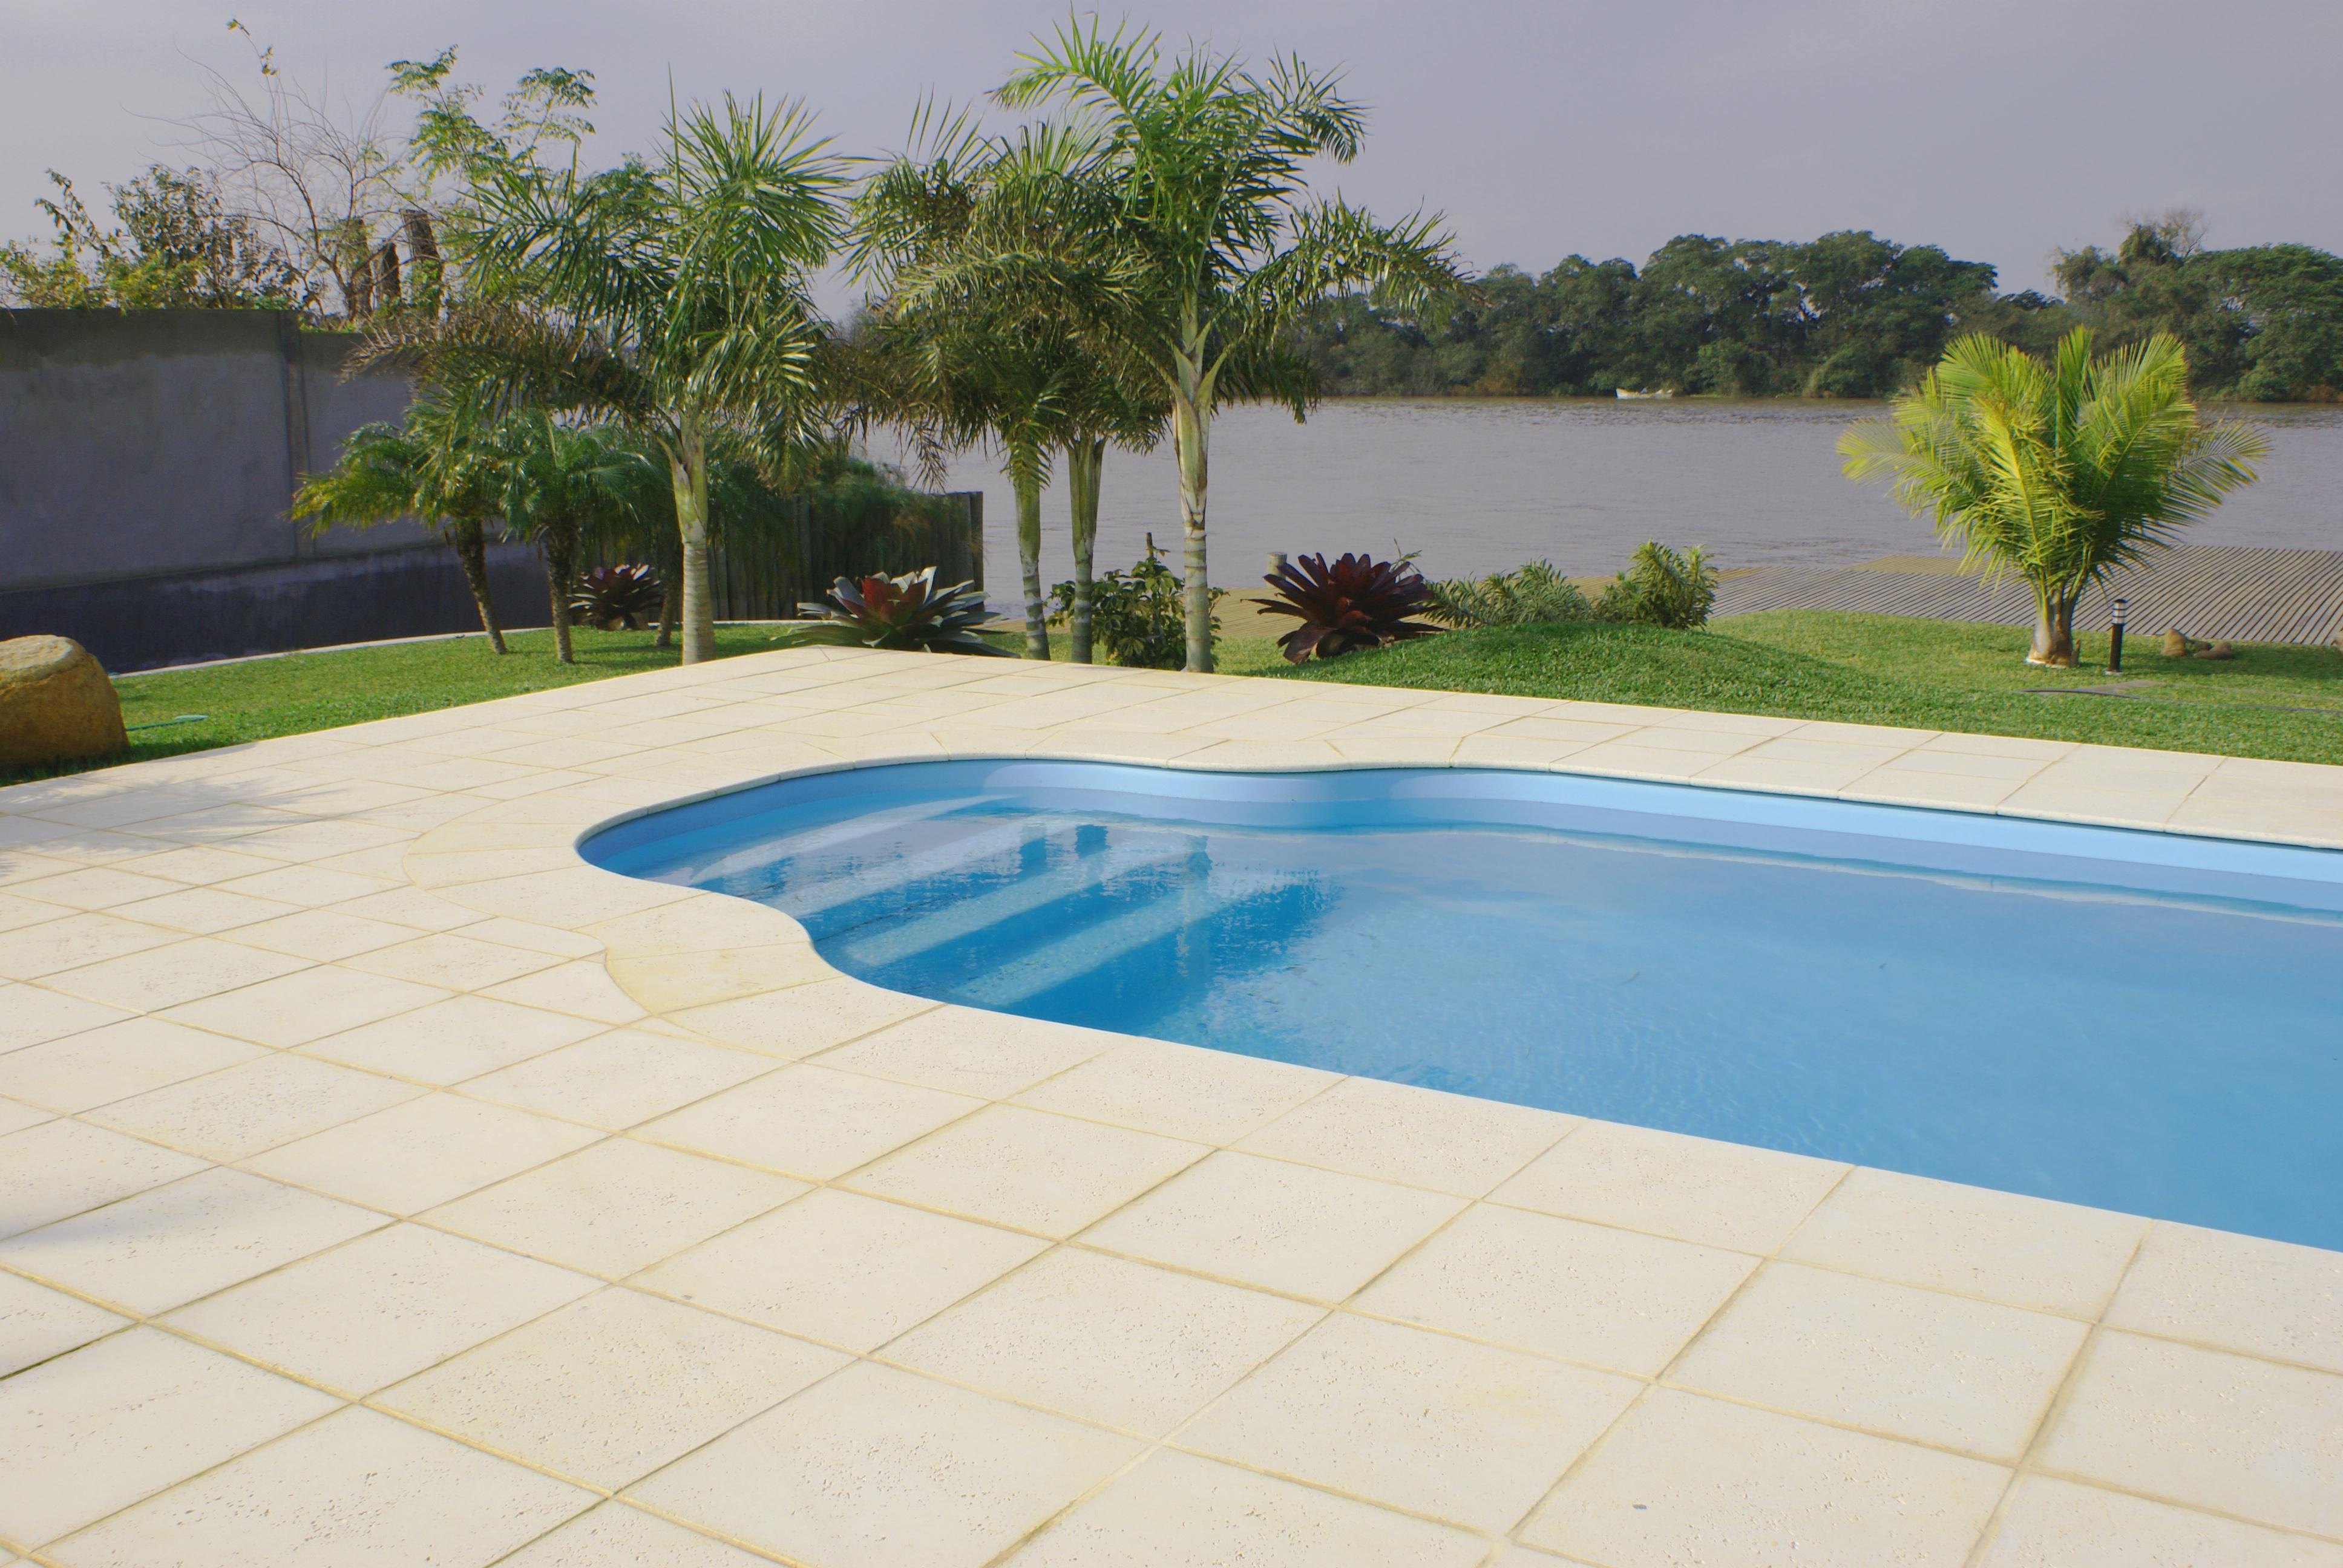 Pisos antiderrapantes para reas de piscinas decorando casas for Modelos de piscinas para fincas